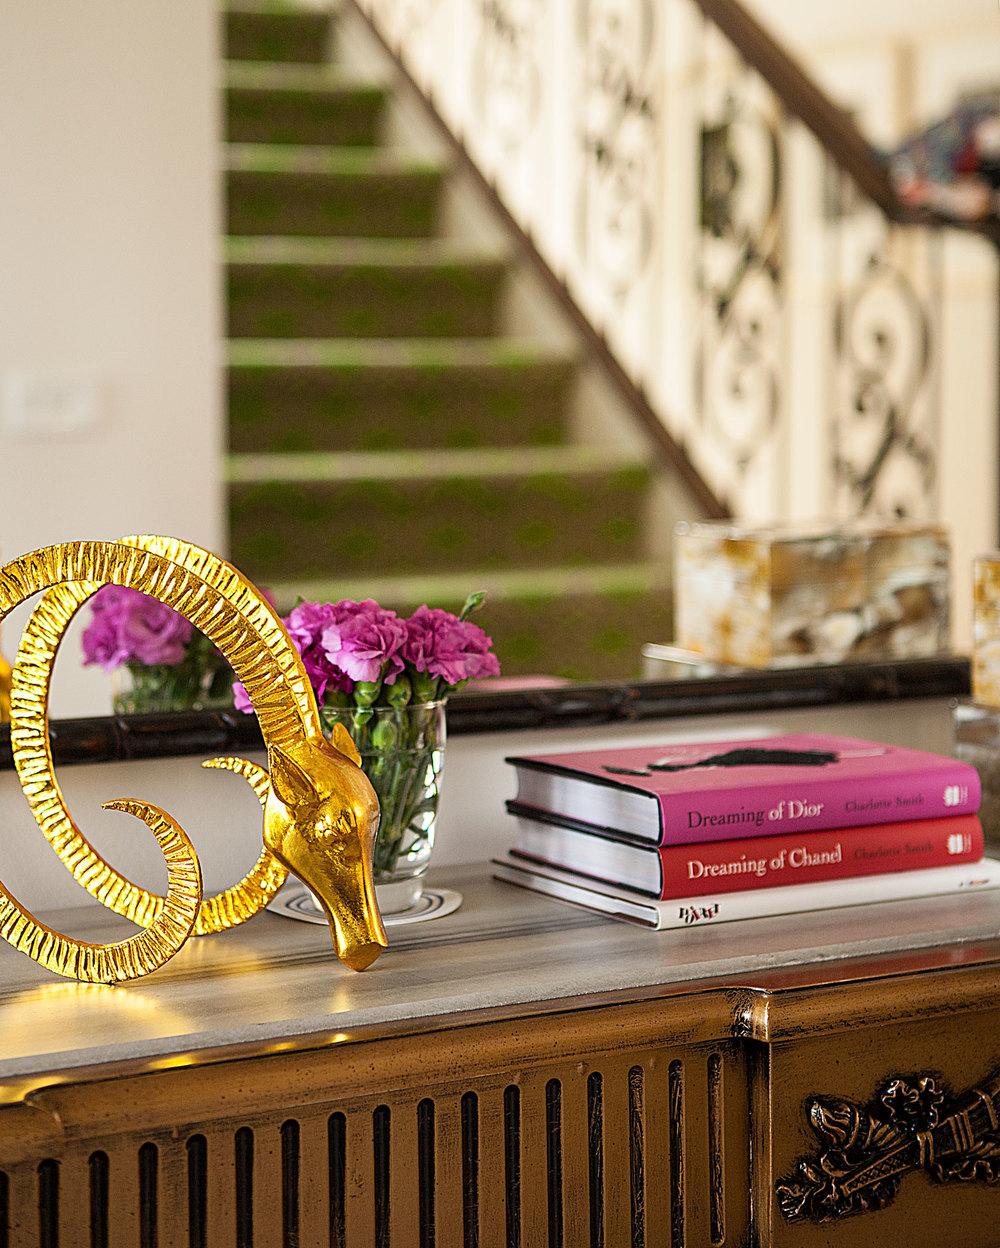 Portfolio interior design diane bergeron interiors - Antique Cabinet Chest Vintage Gold Deer Horns Chanel